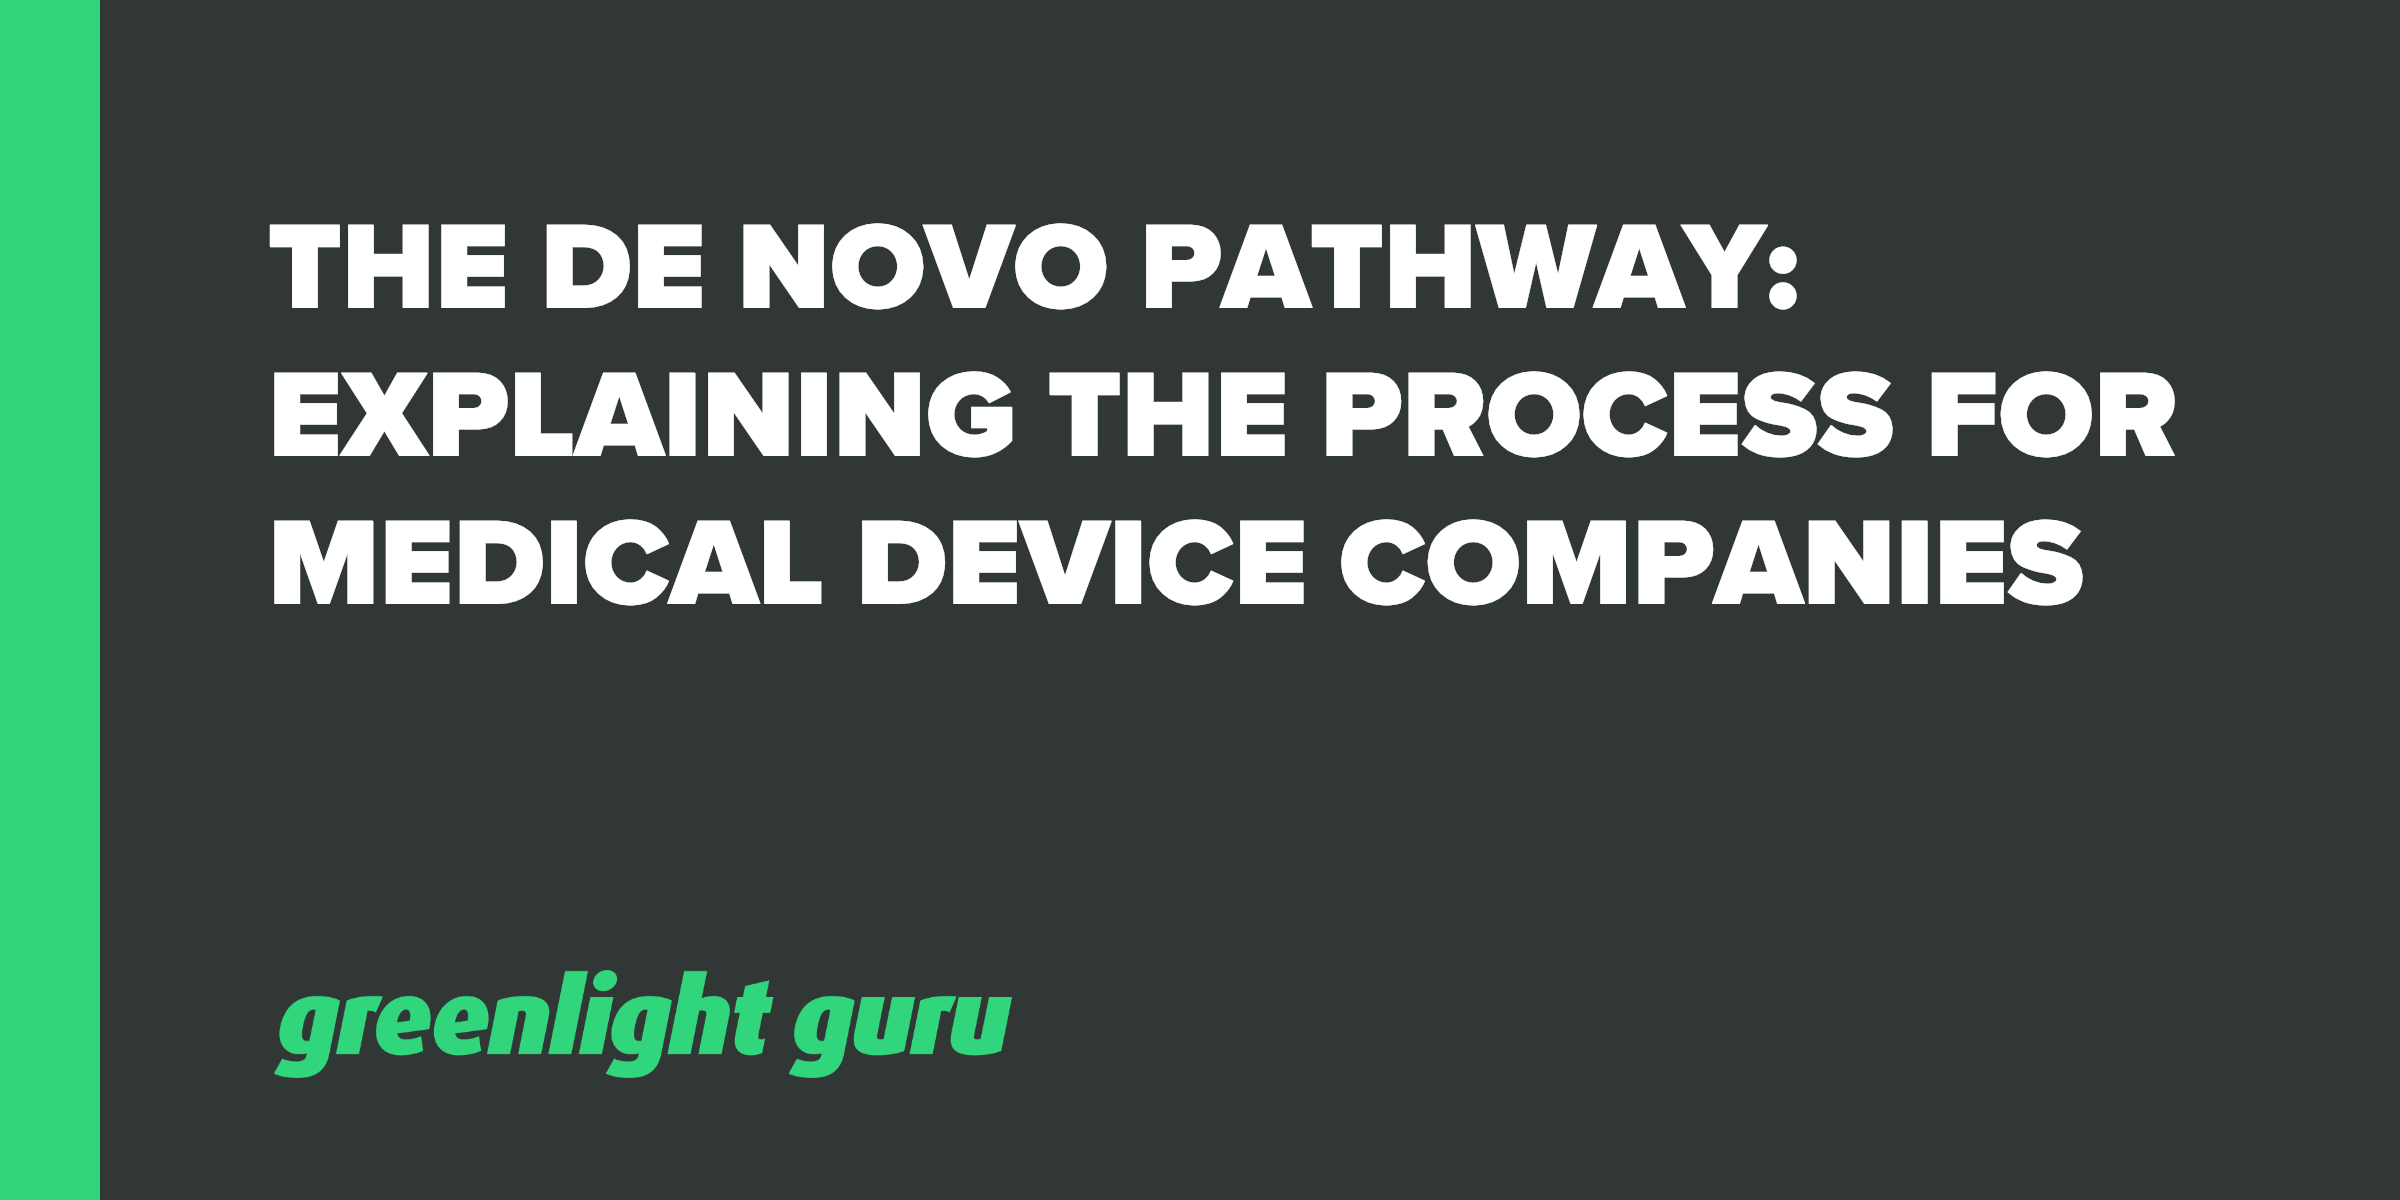 De novo pathway for medical device companies